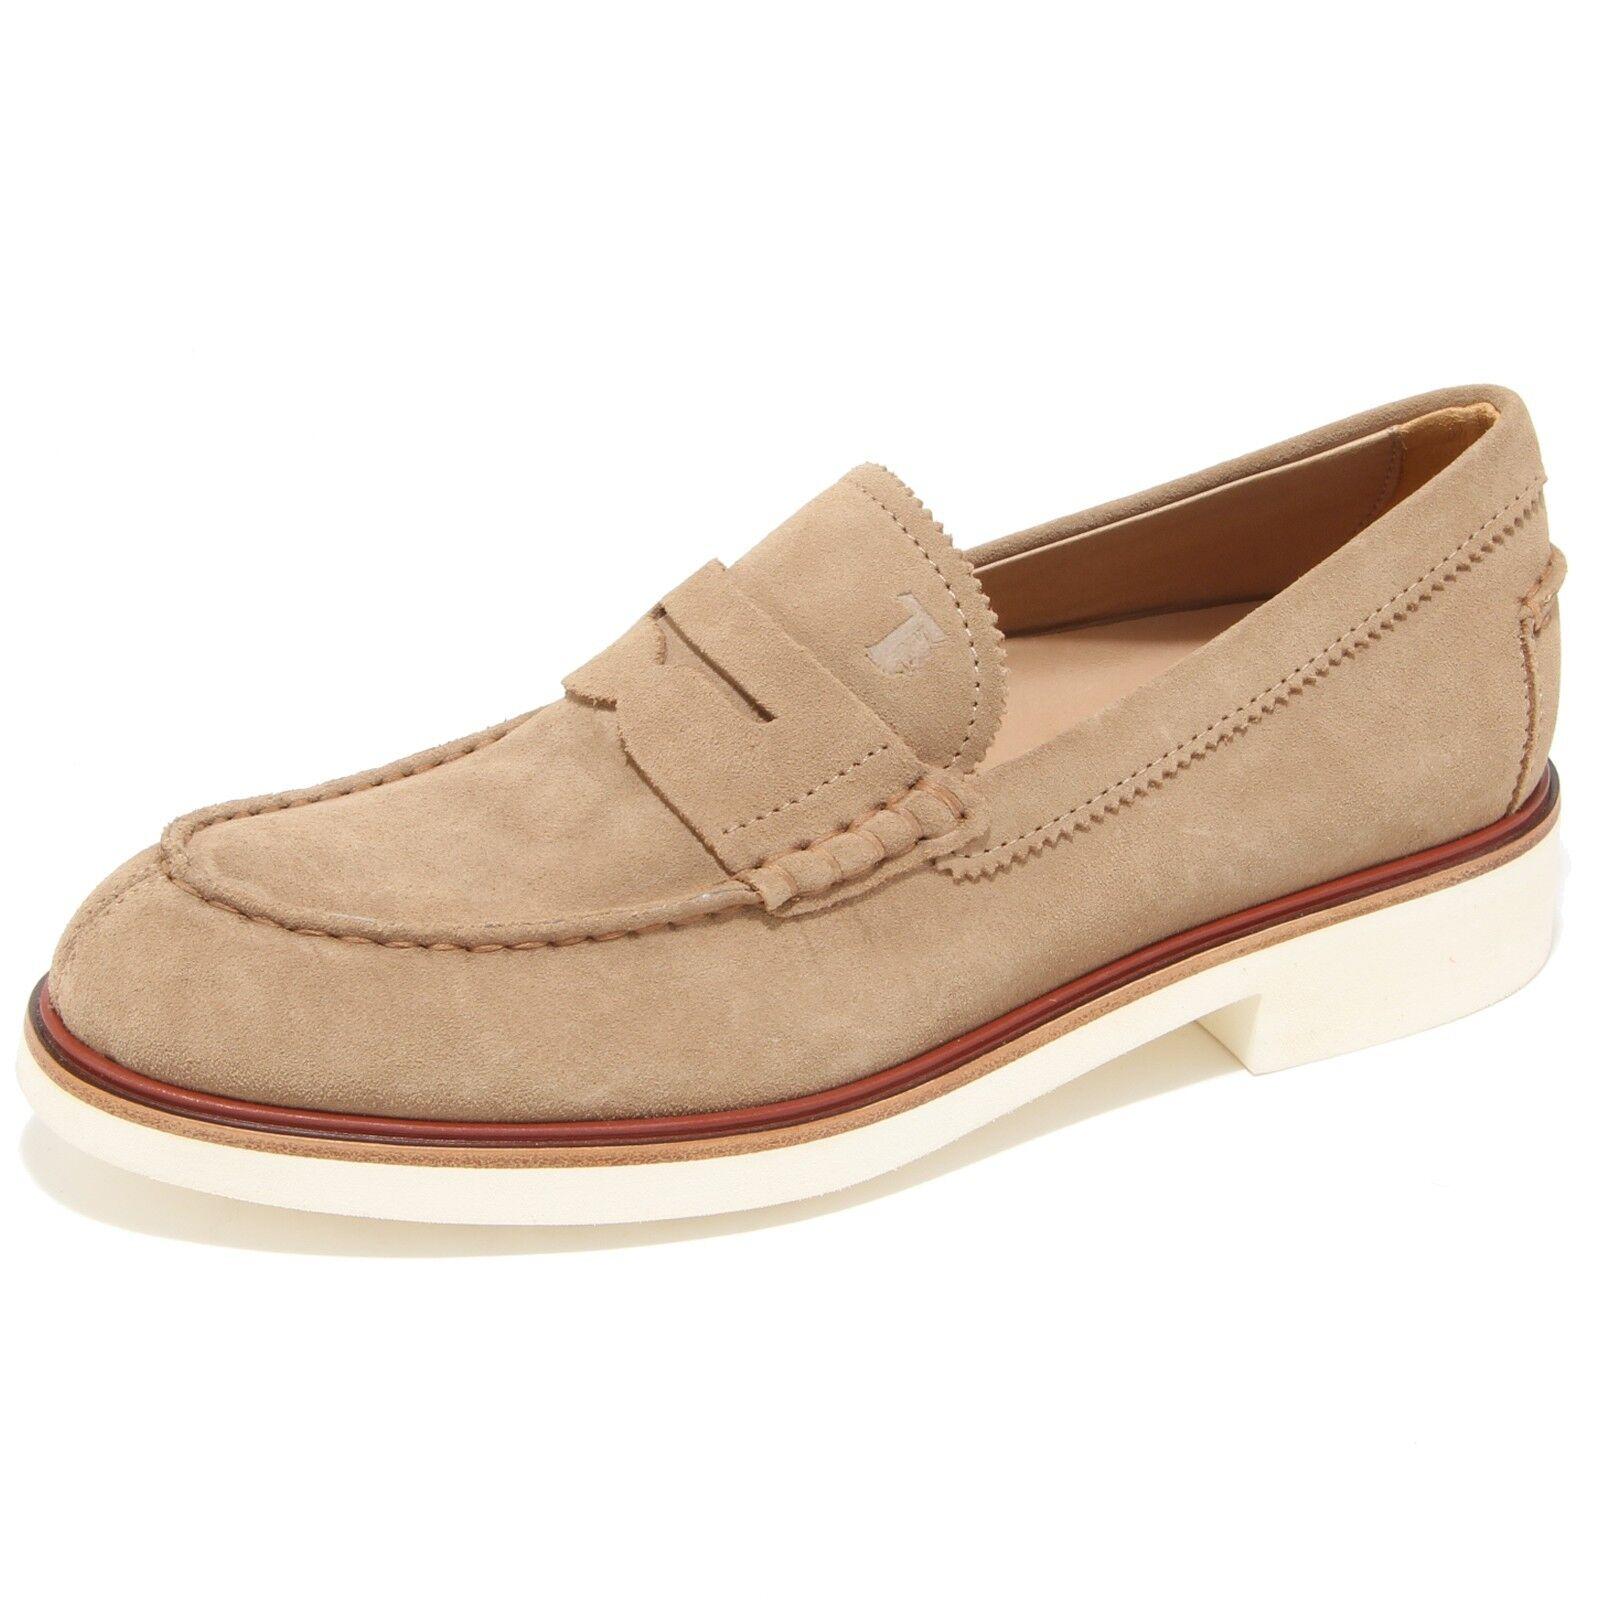 0623L mocassini uomo TOD'S fondo light scarpe loafers shoes men